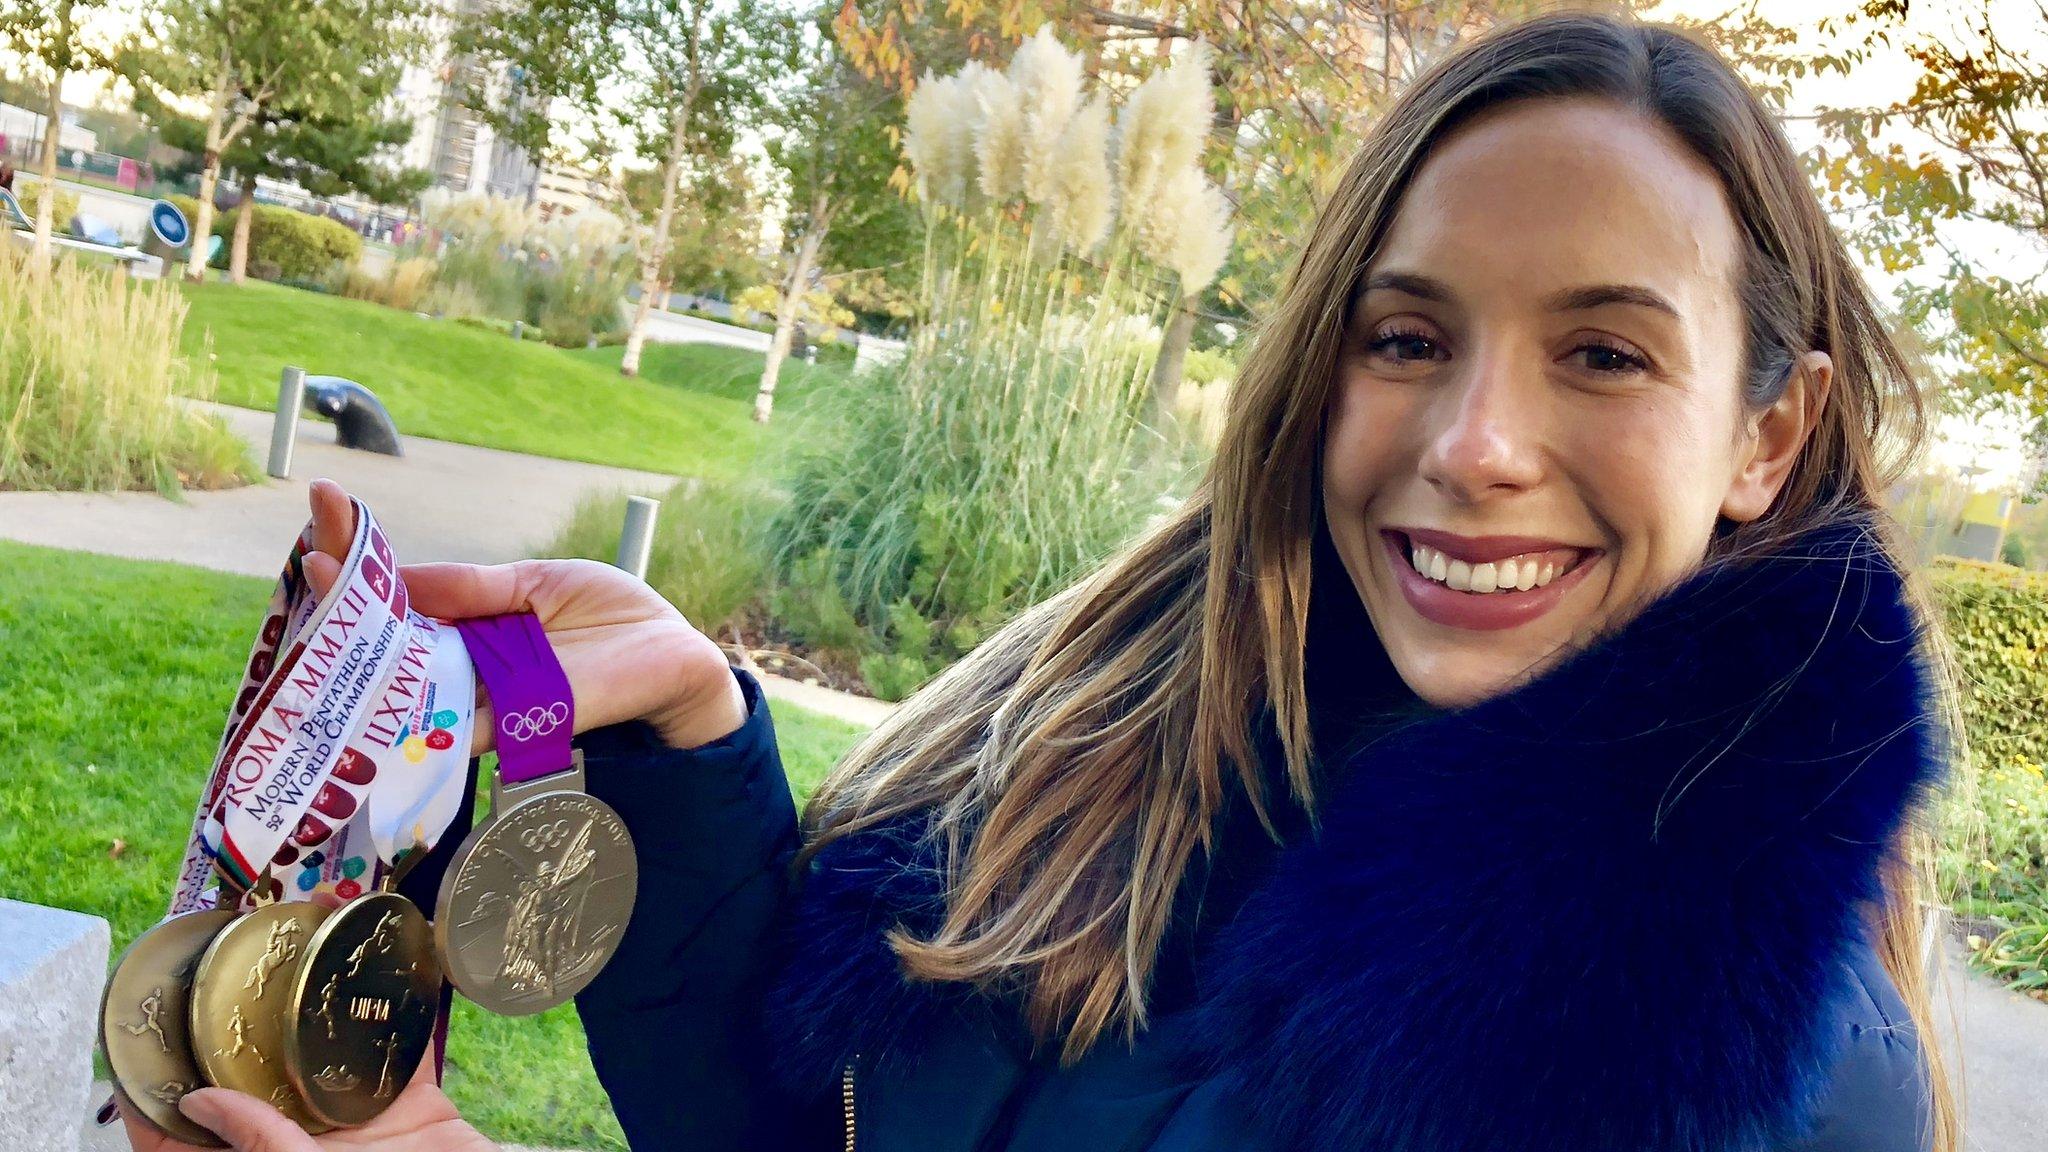 Samantha Murray: London 2012 silver medallist retires from modern pentathlon